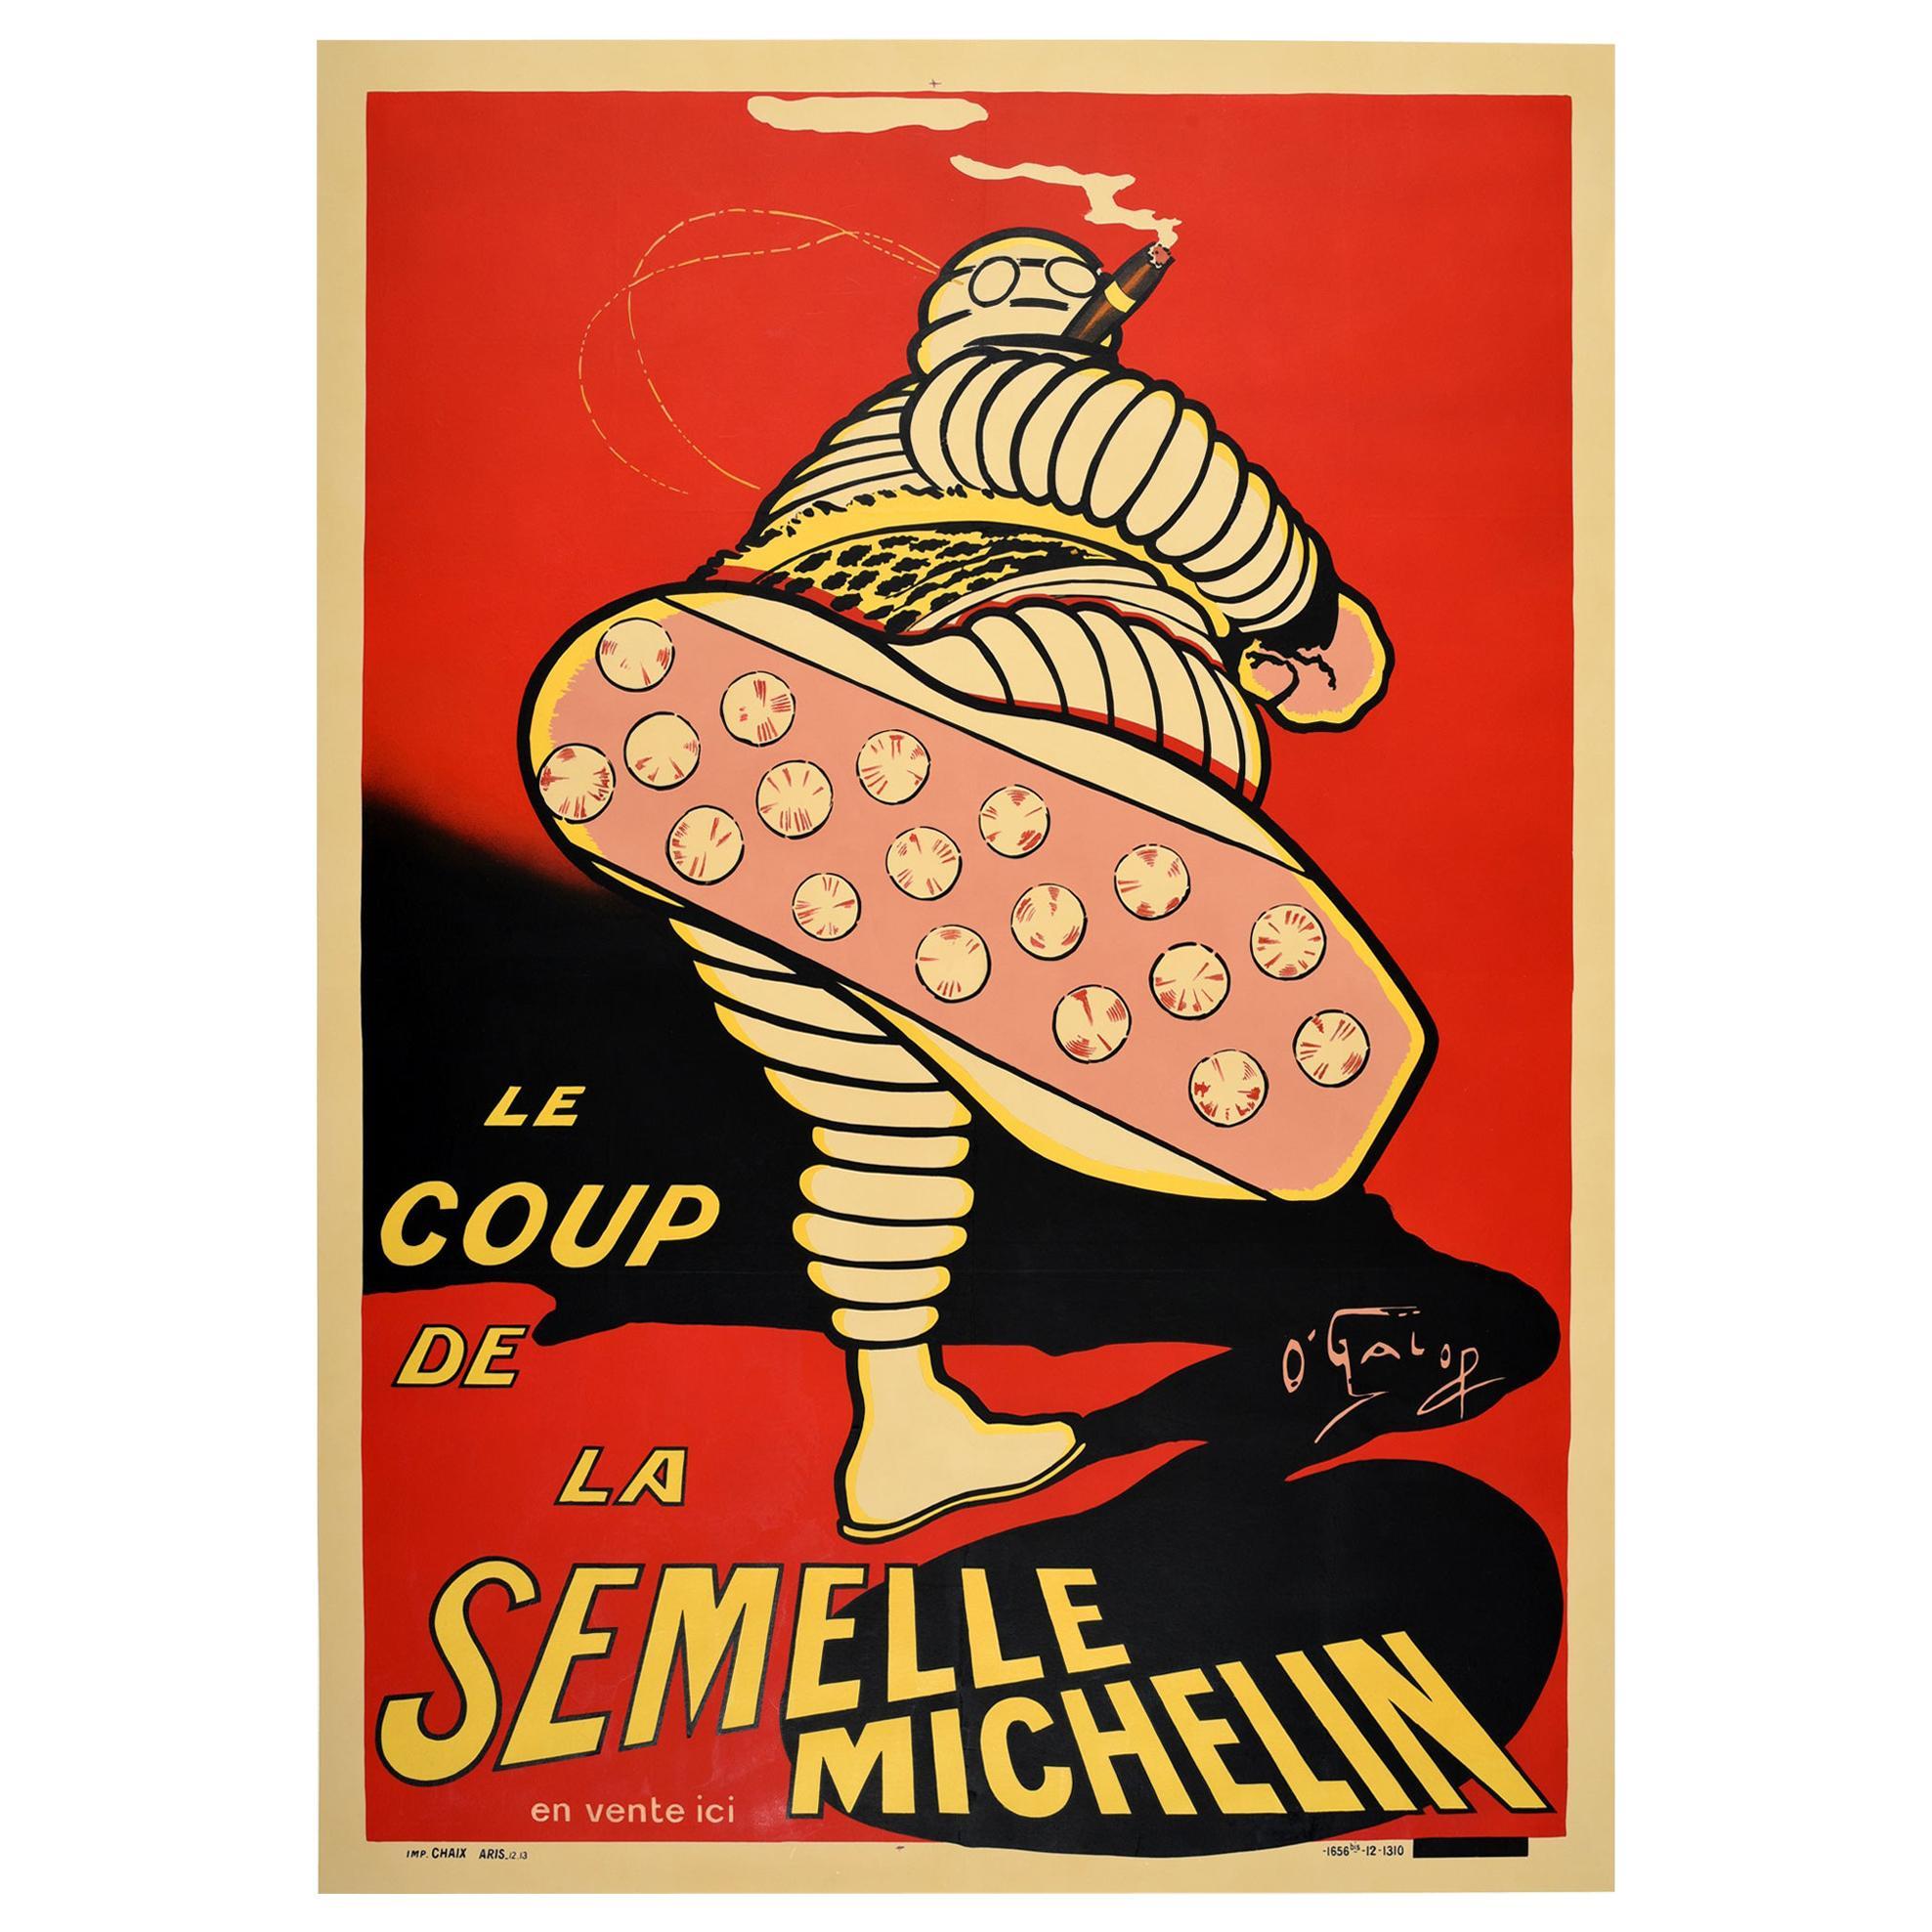 Original Antique Advertising Poster Iconic Bibendum Michelin Man Design O'Galop